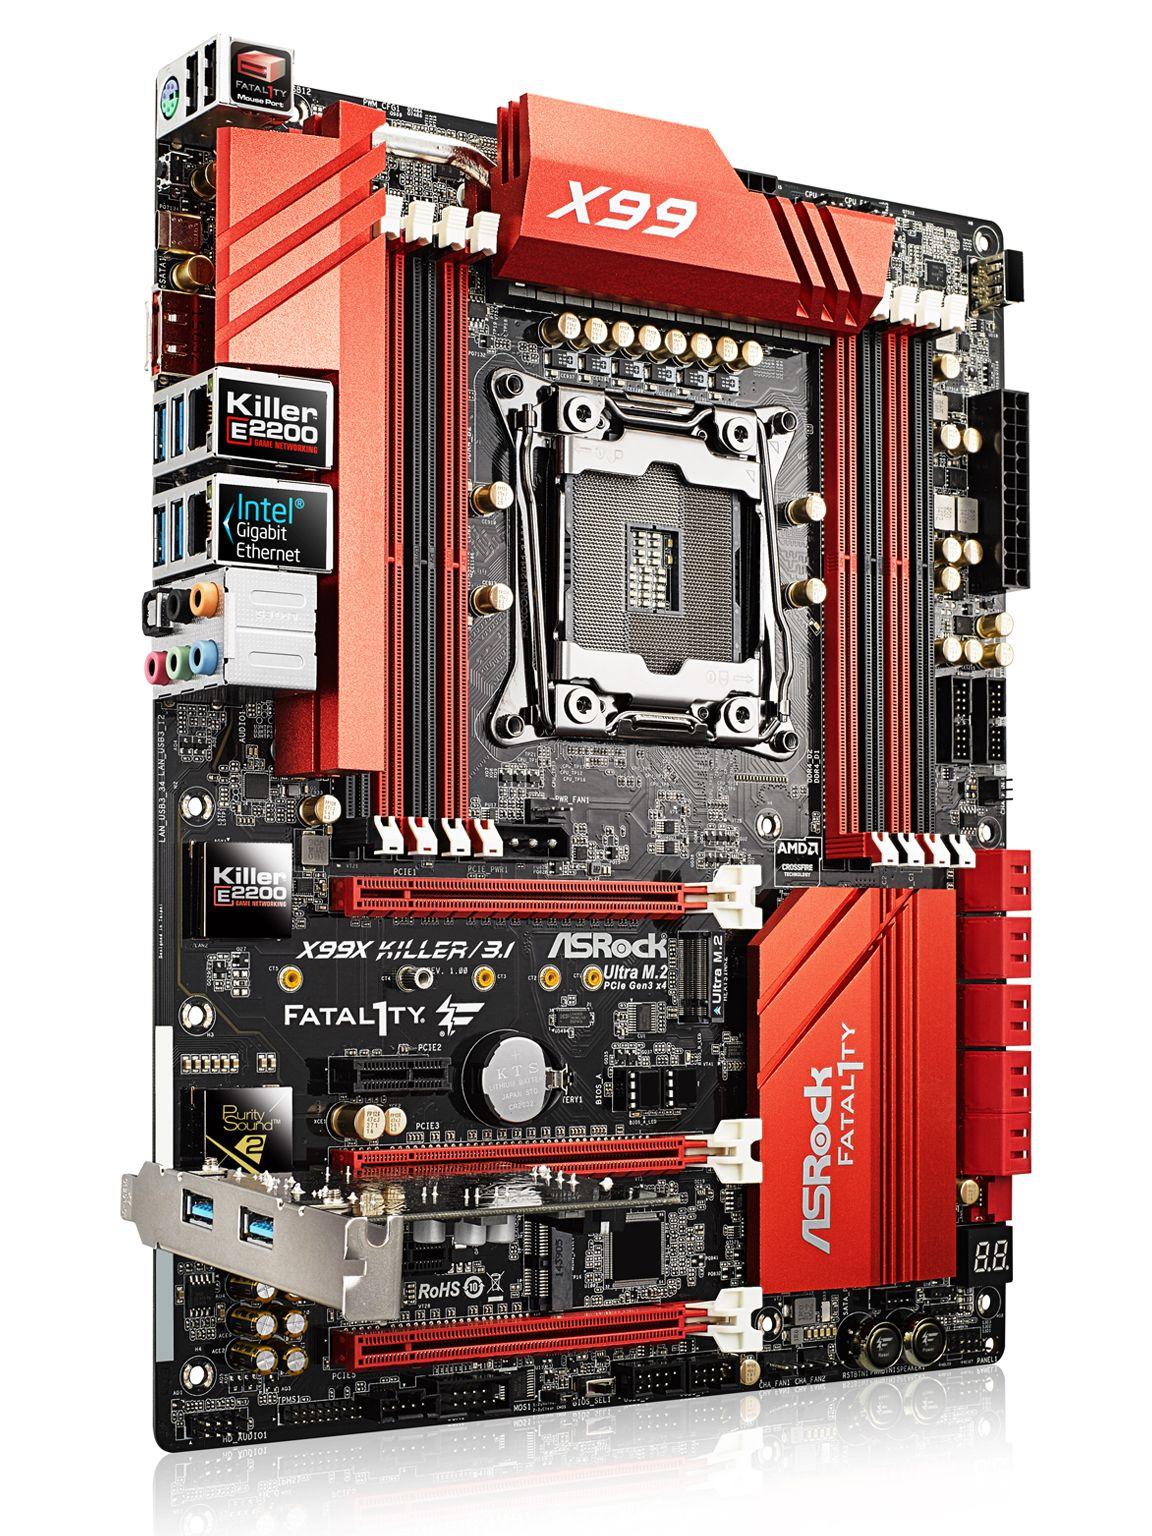 Fatal1ty X99X Killer/3 1 / Gaming motherboard | d&i awards